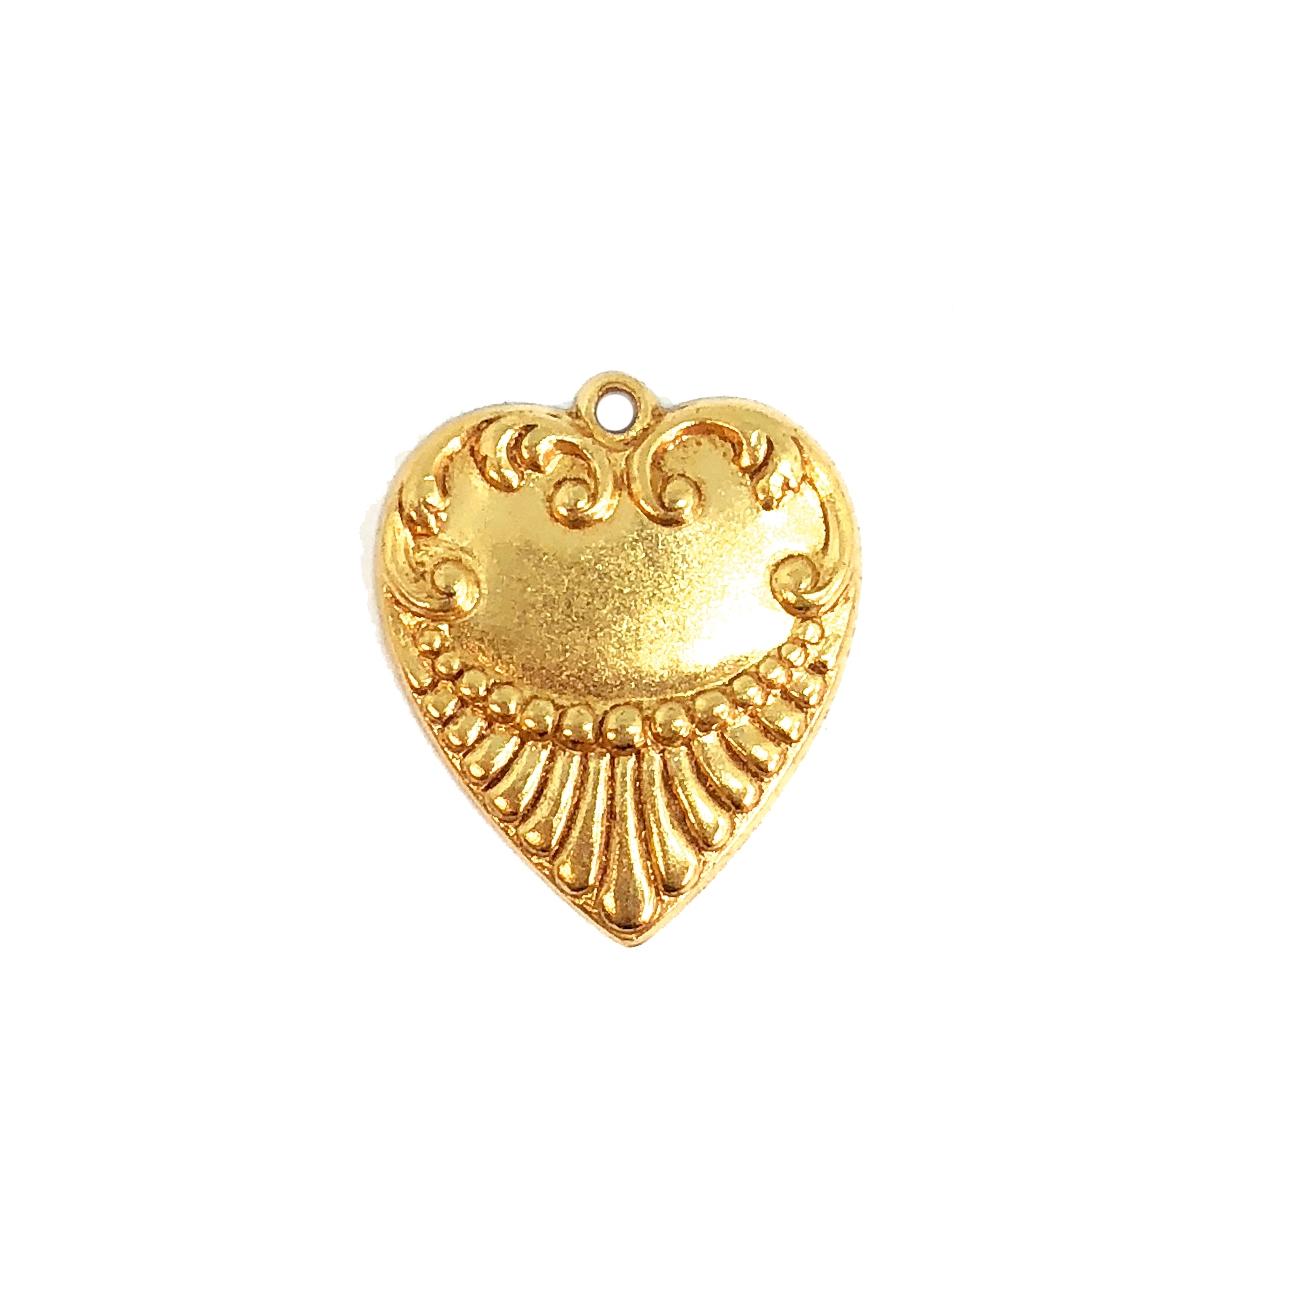 Pendants Vintage Jewellery components Hearts Crystal rhinestone12mm X4 CRAFT